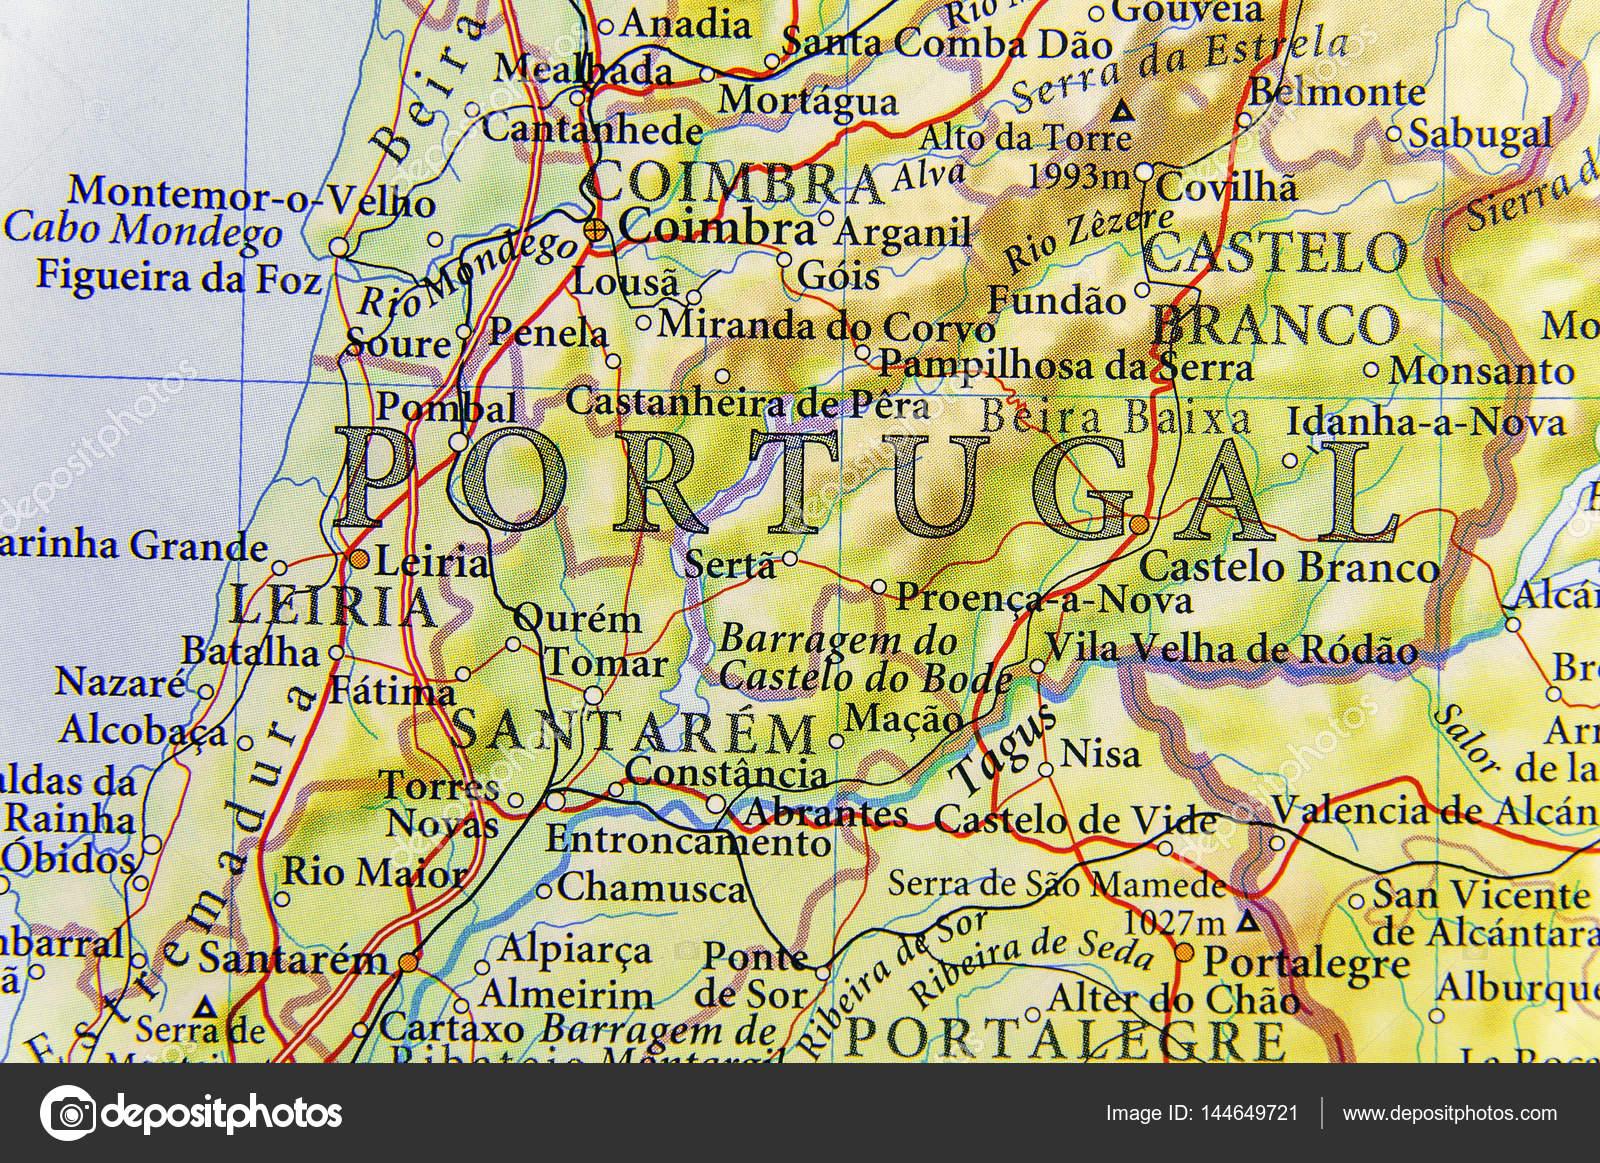 mapa geografico portugal Descargar mapa coimbra | Mapa geográfico de país europeo Portugal  mapa geografico portugal